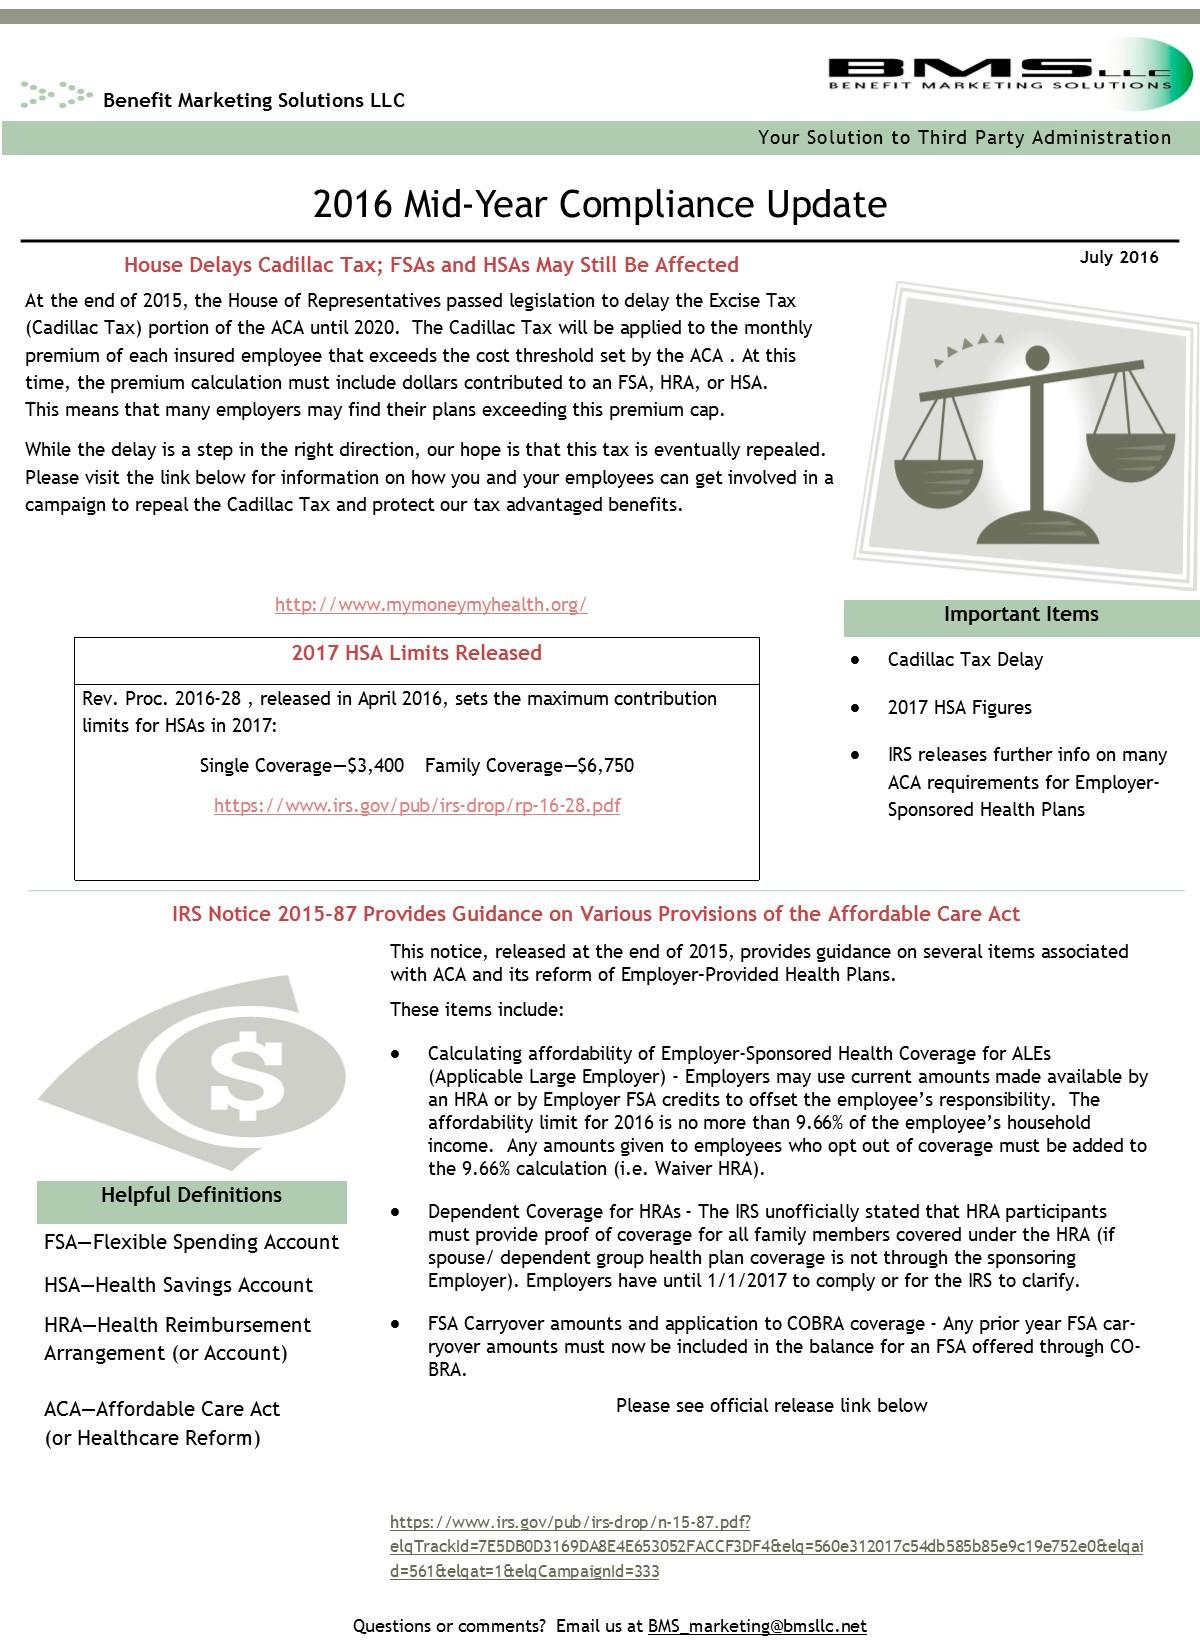 Benefit Marketing Solutions LLC: News